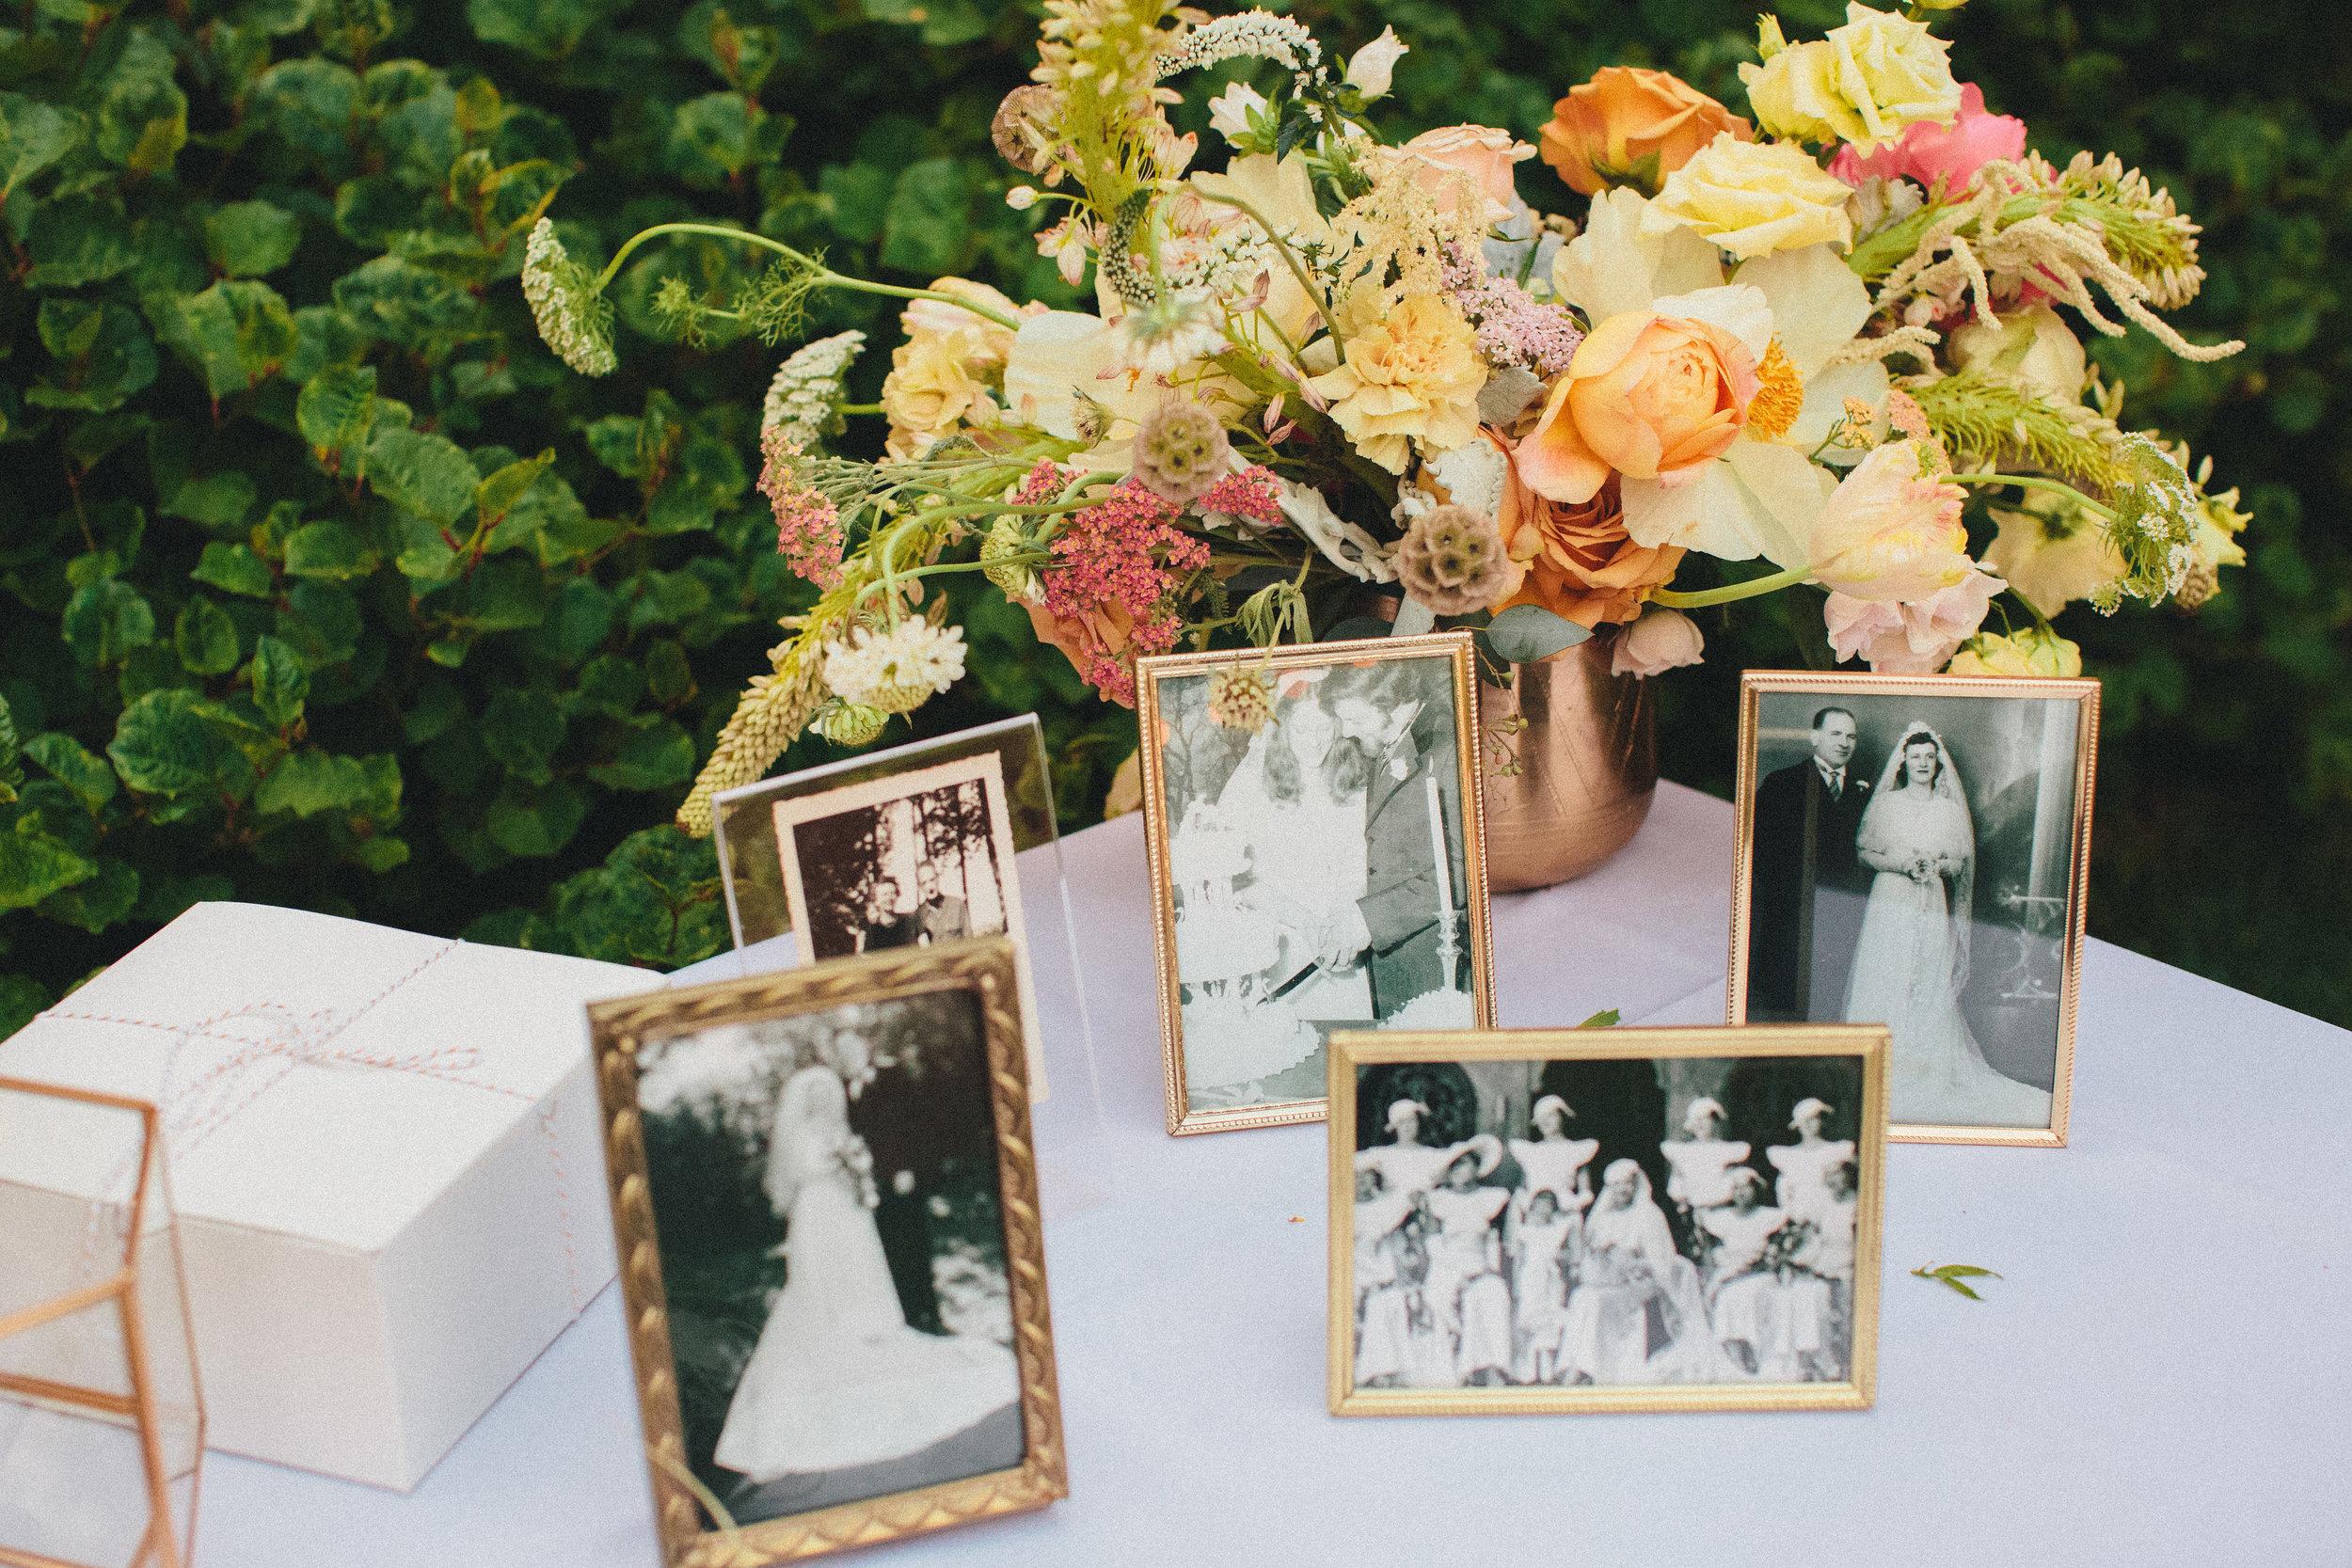 landry_lovelace_wedding_jbobephoto-885.jpg